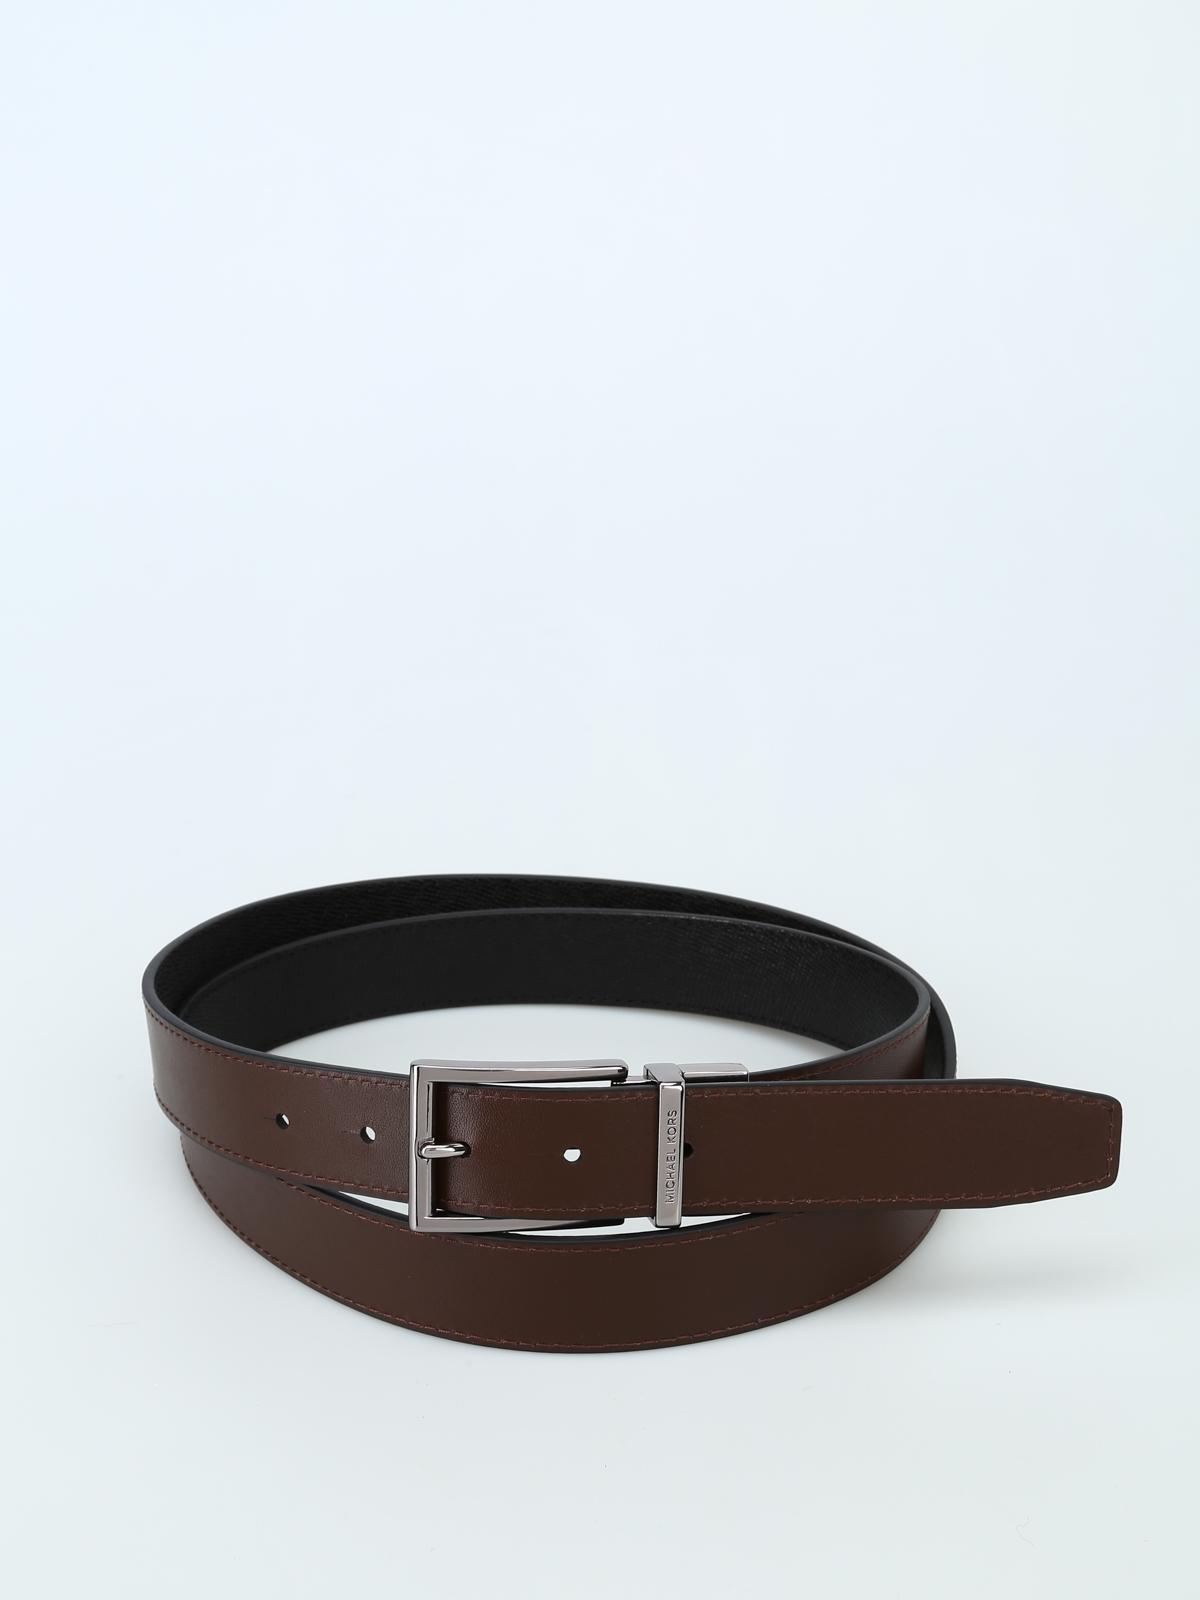 b8e77c06d8 Michael Kors - Cintura in pelle reversibile - cinture - 39F8TBLY4L193